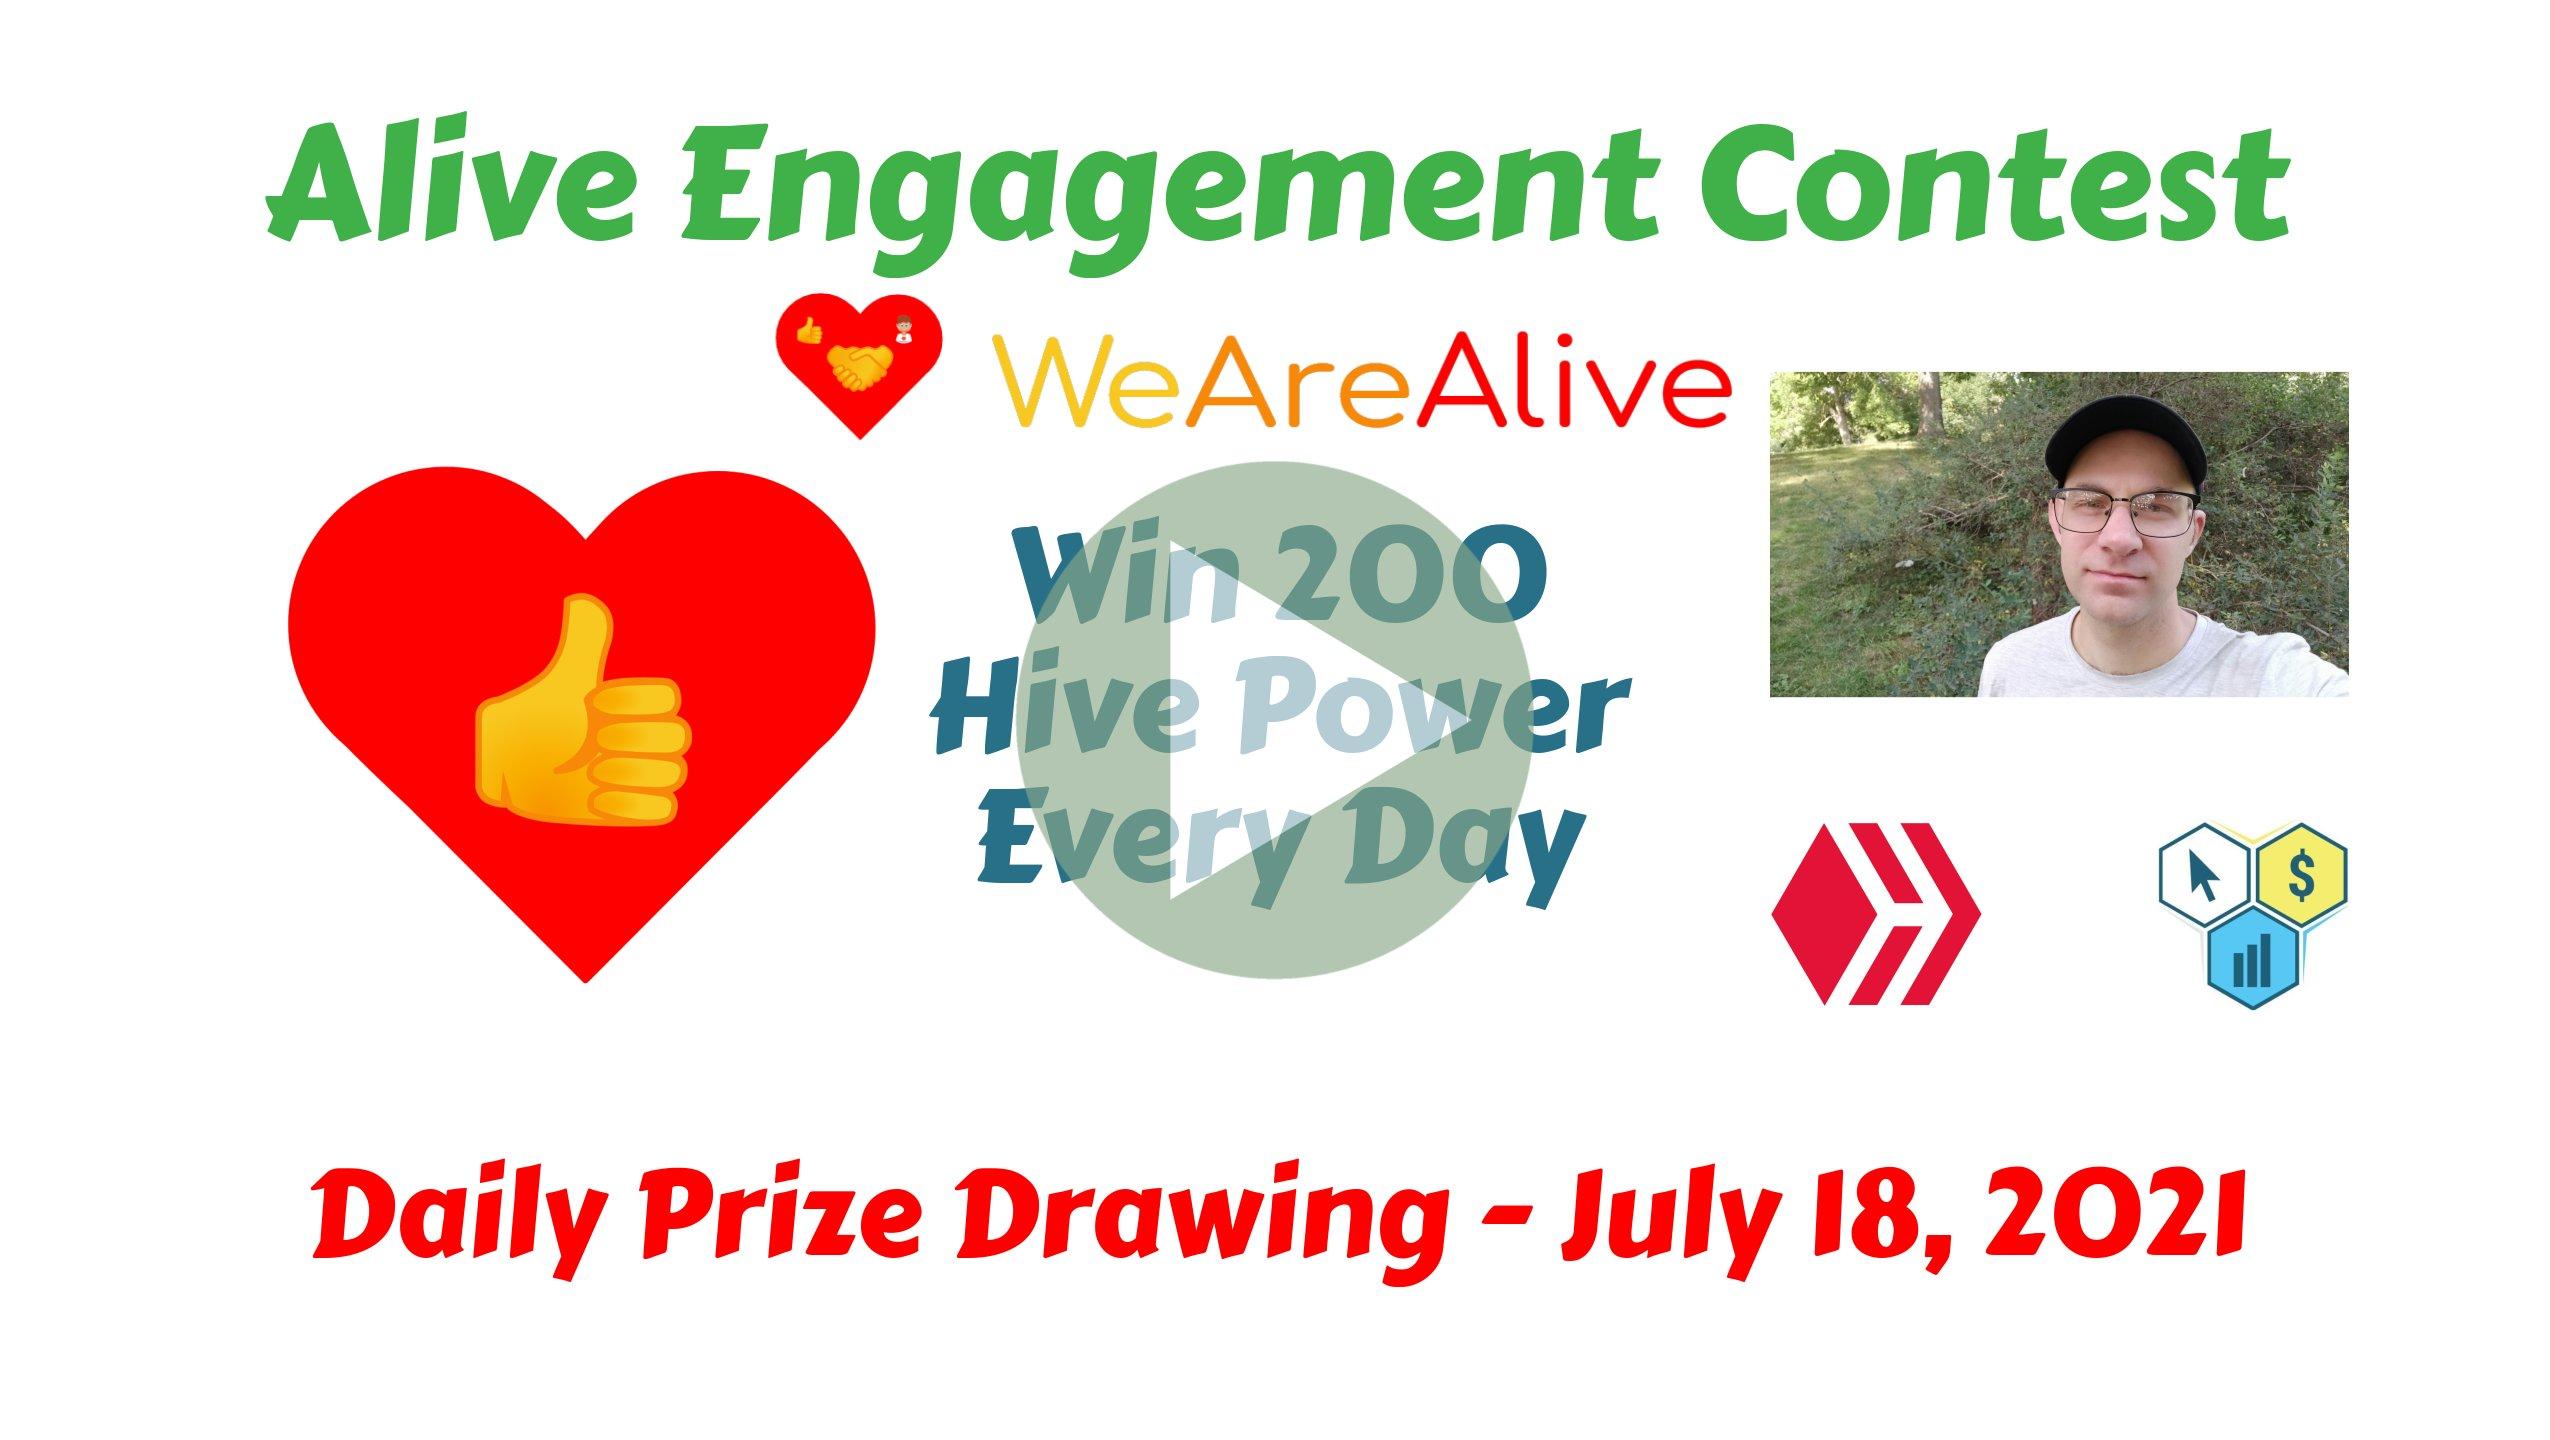 Alive Engagement Contest Video